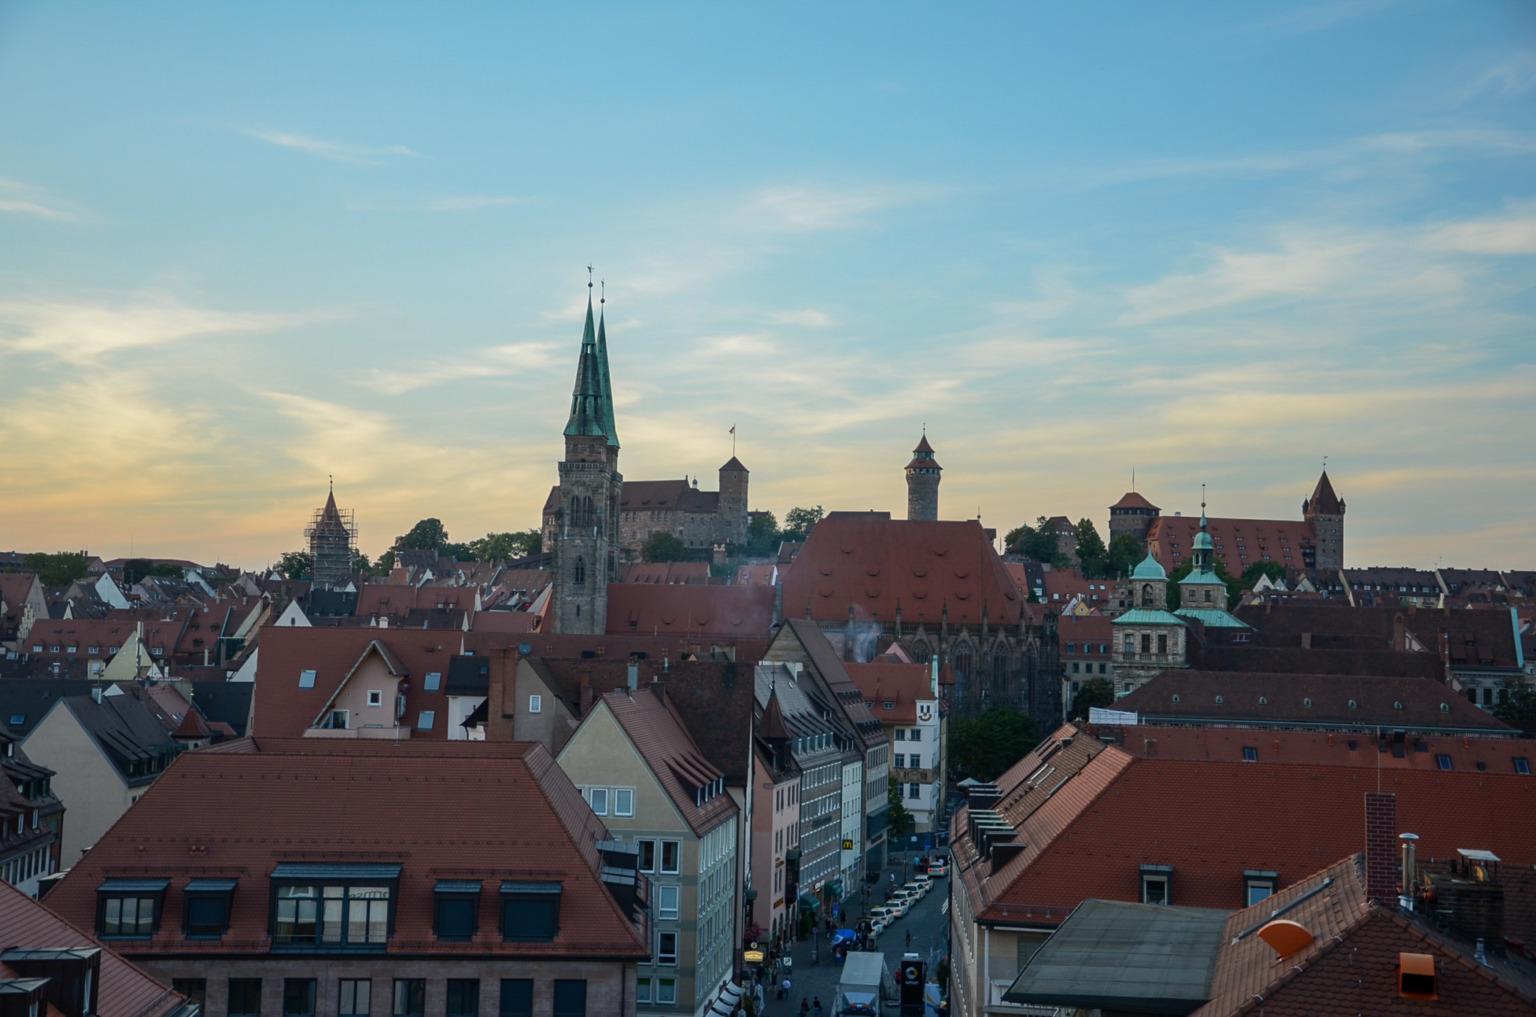 Nürnberg als Reiseziel im Herbst